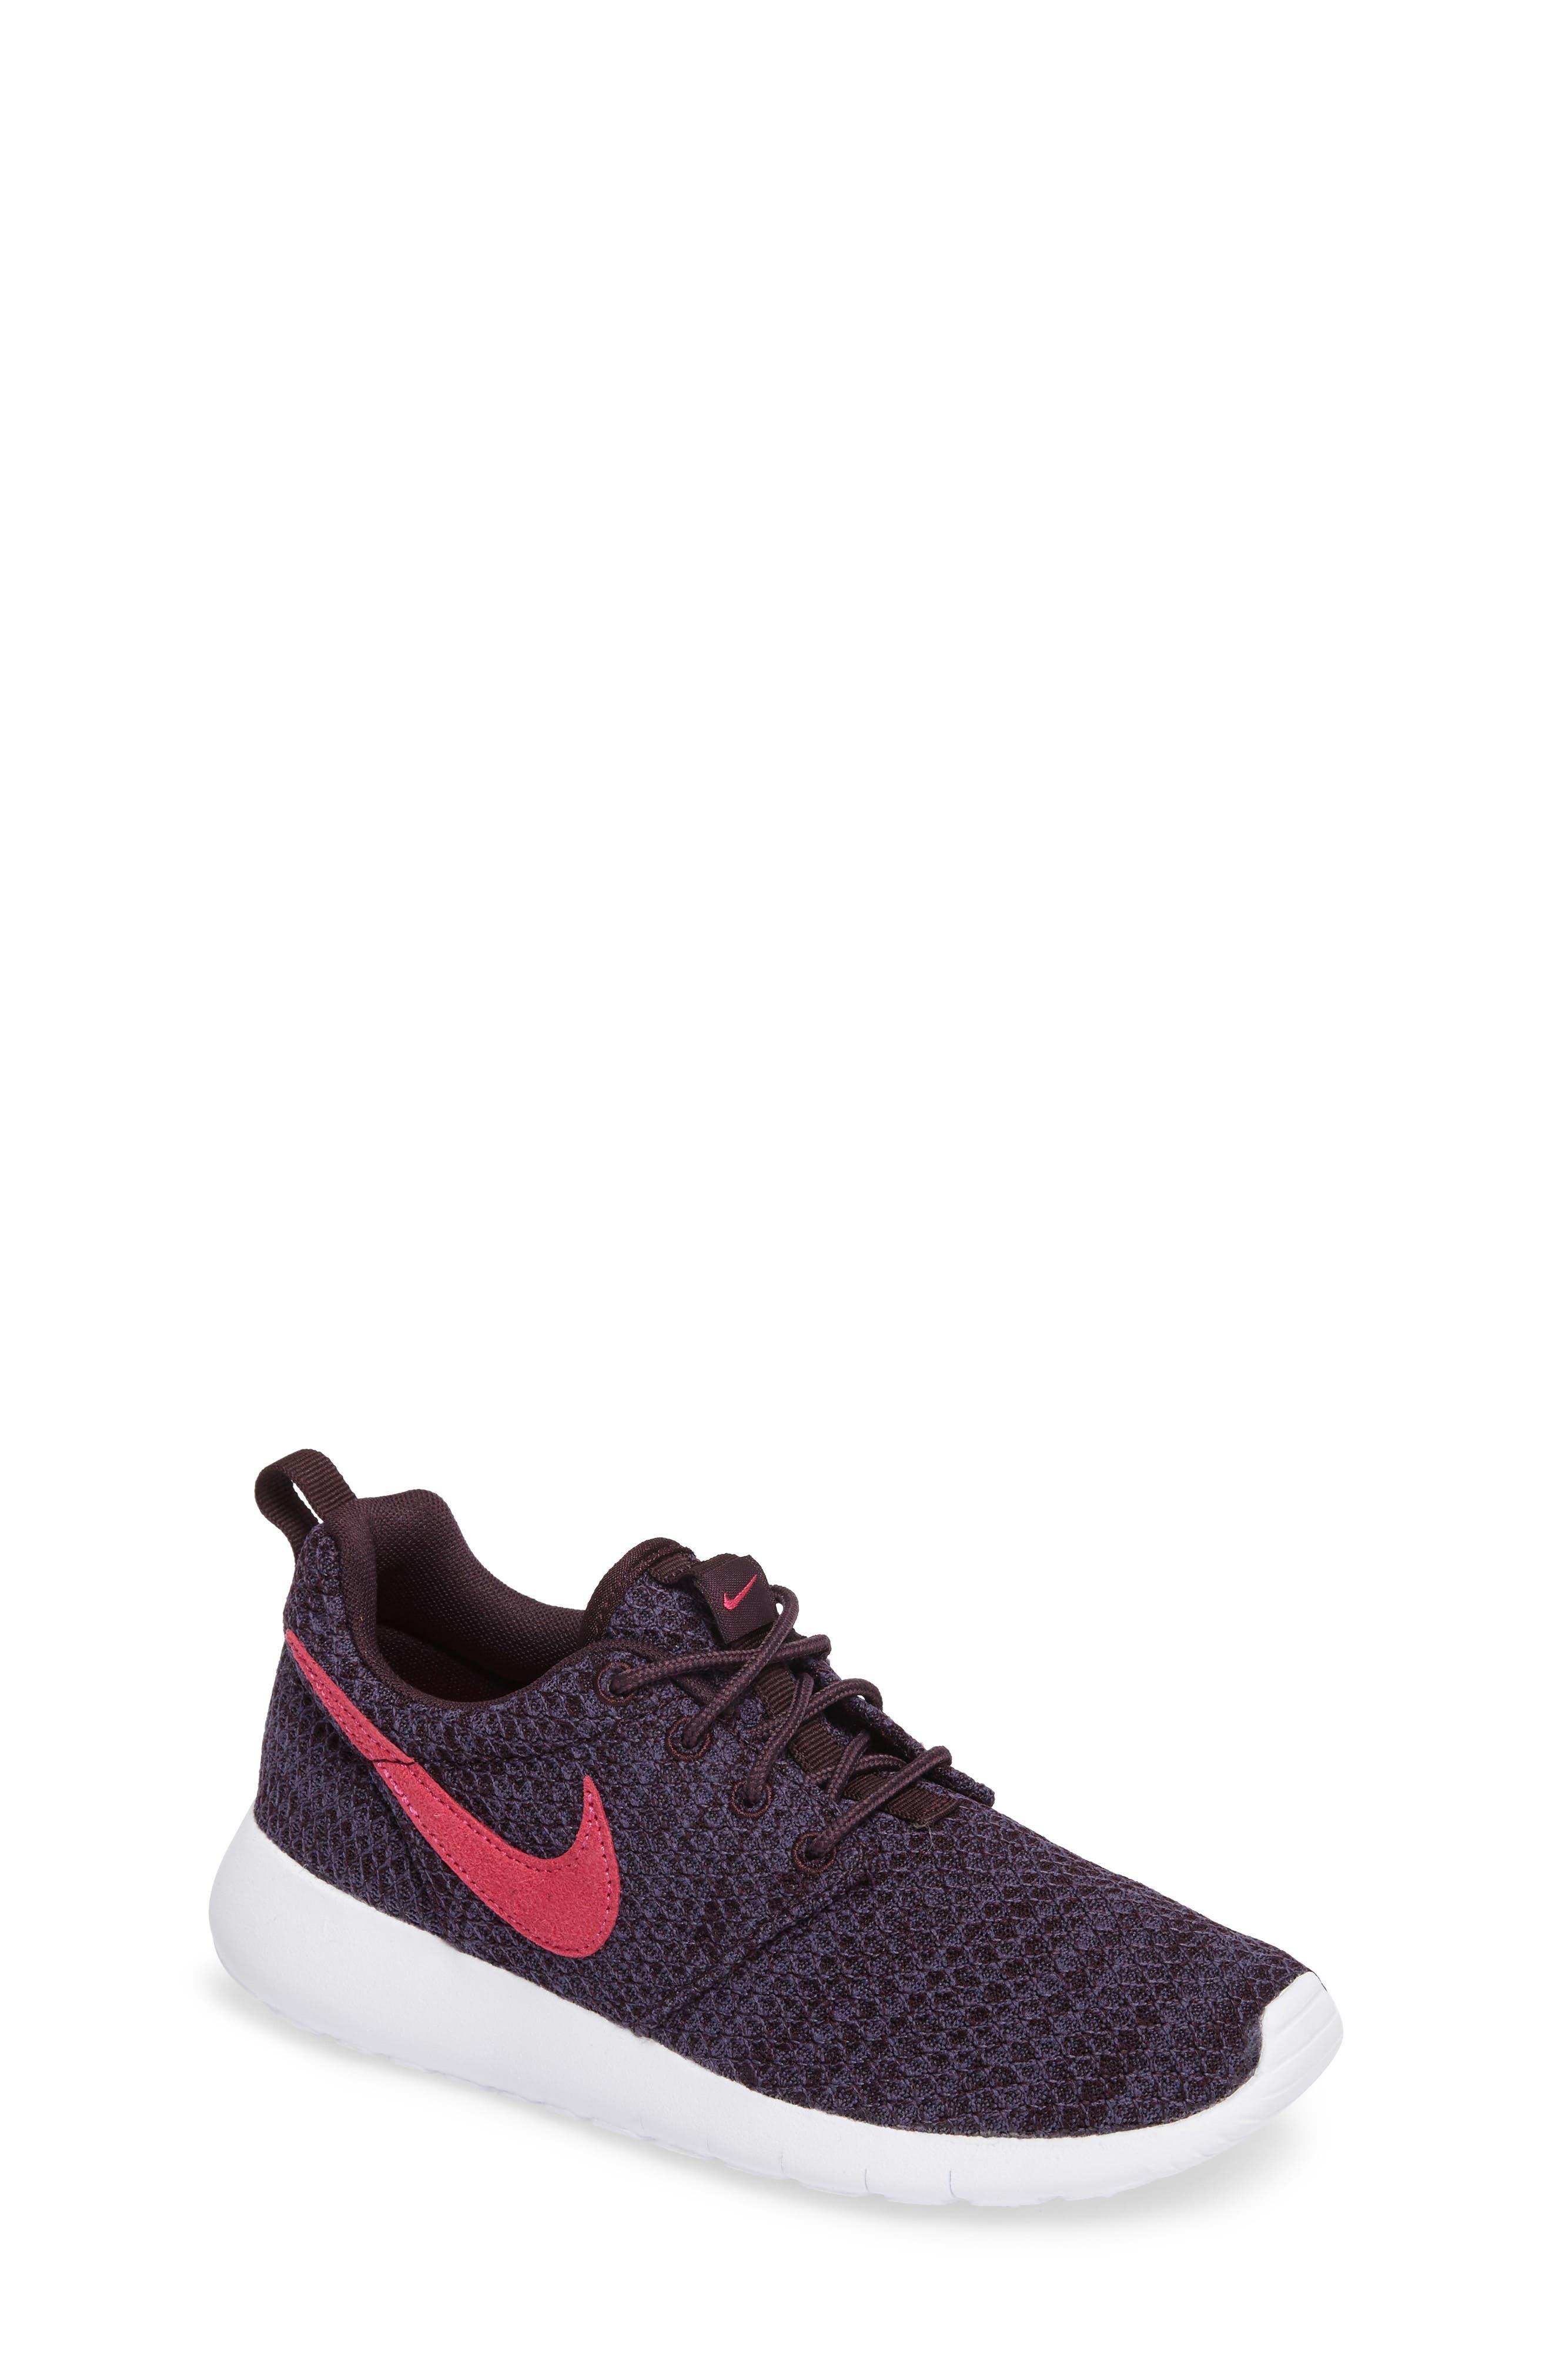 'Roshe Run' Athletic Shoe,                             Main thumbnail 56, color,